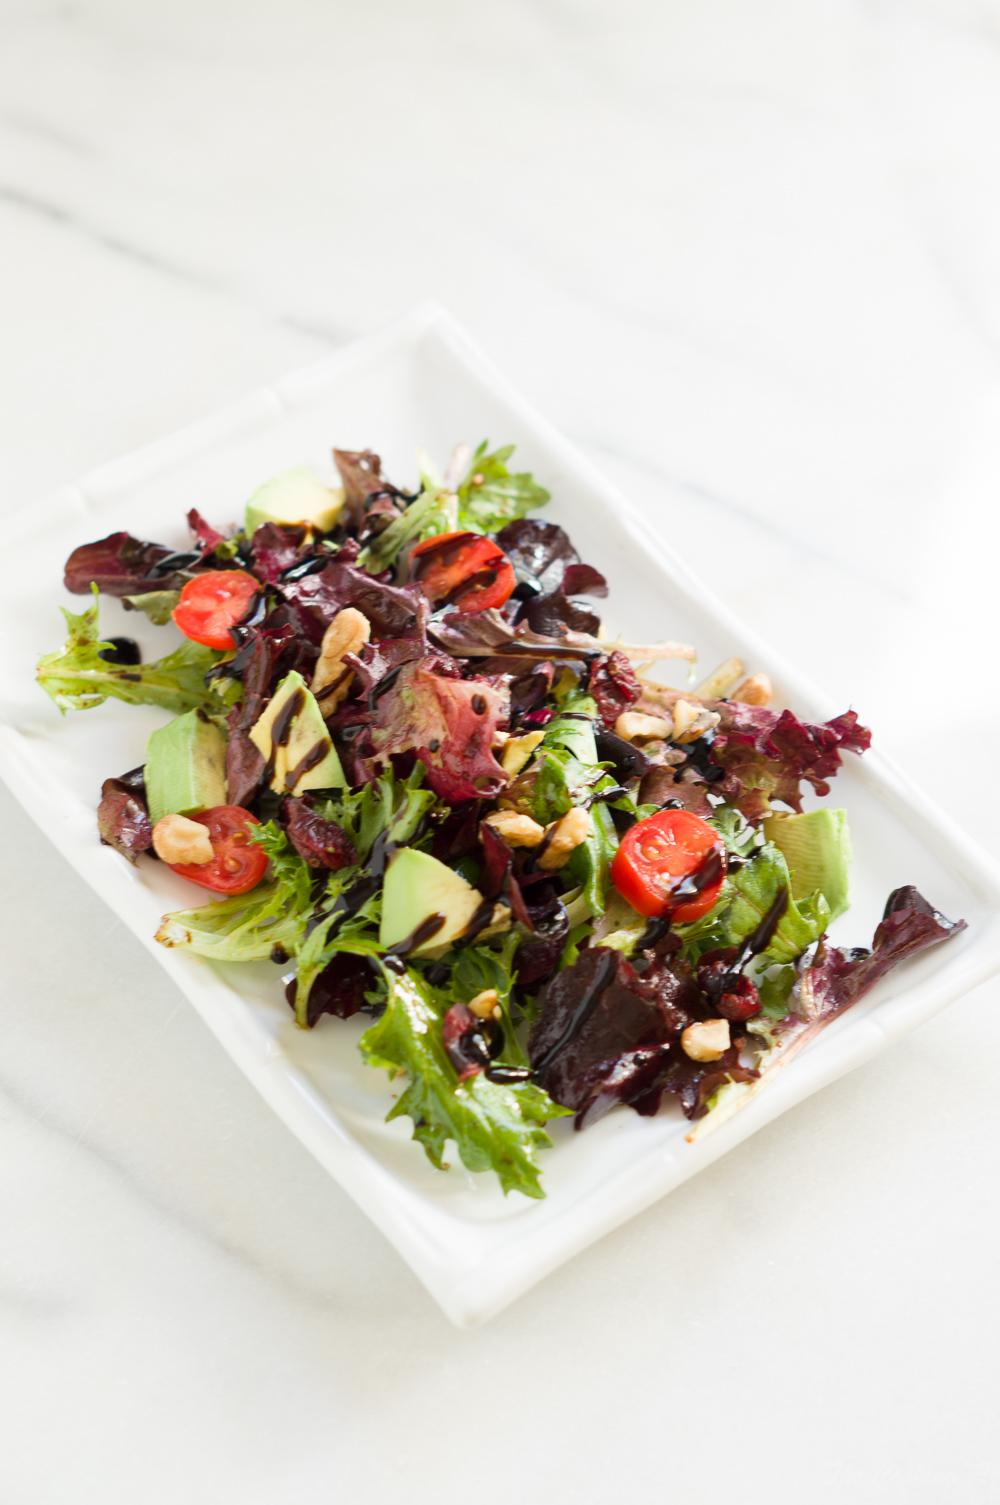 Tomato, Avocado, Walnut Salad